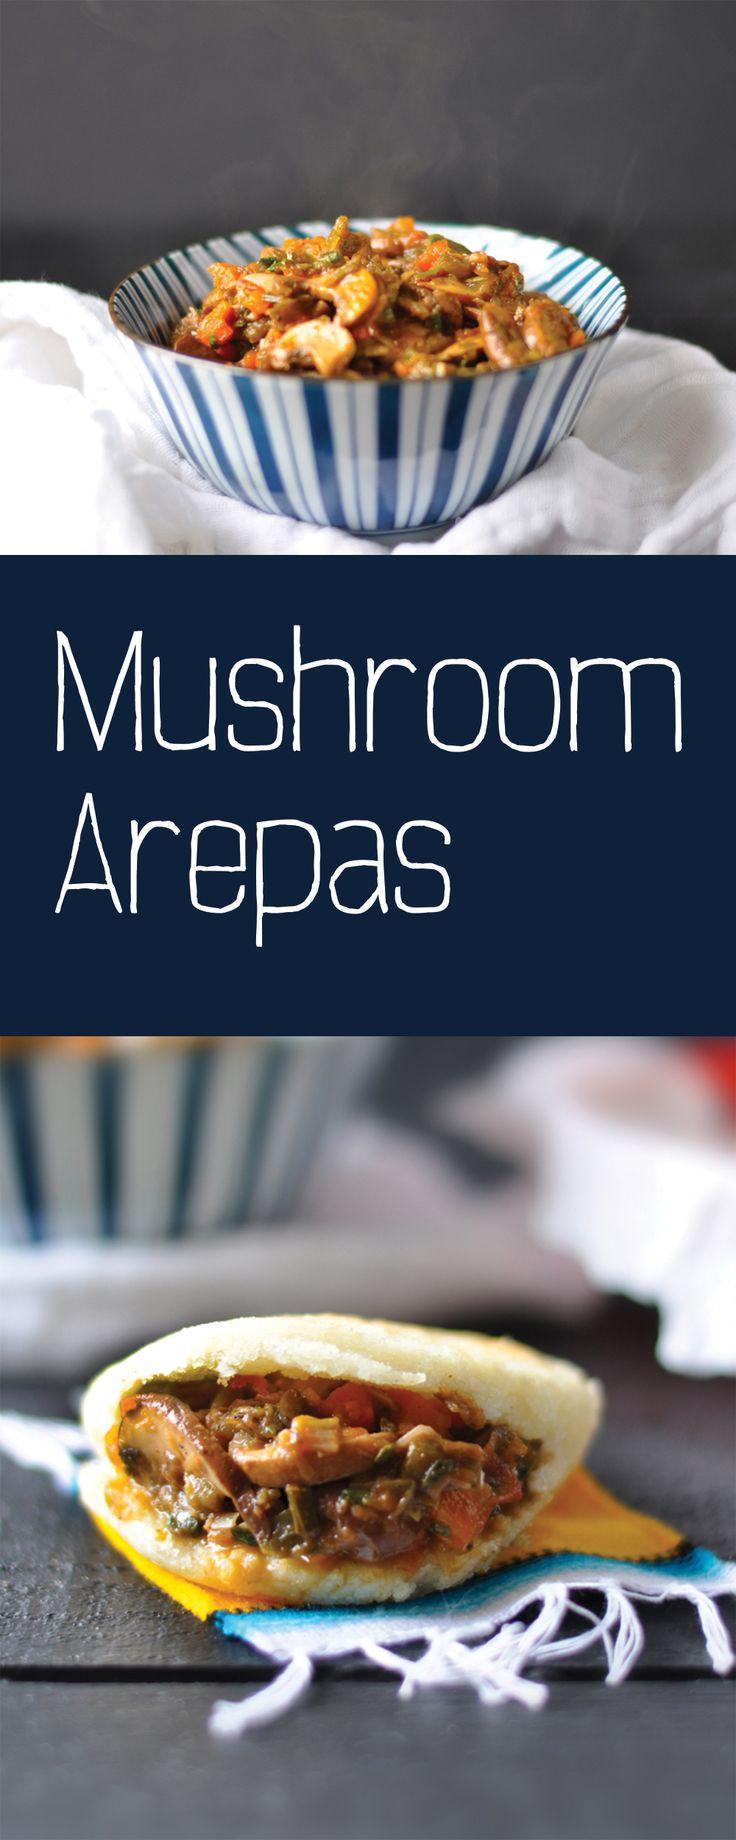 Vegan Venezuelan Mushroom Arepas. A sweet and tangy mushroom filling make a great vegan arepa filling option! #vegan #venezuelan | thymeandlove.com